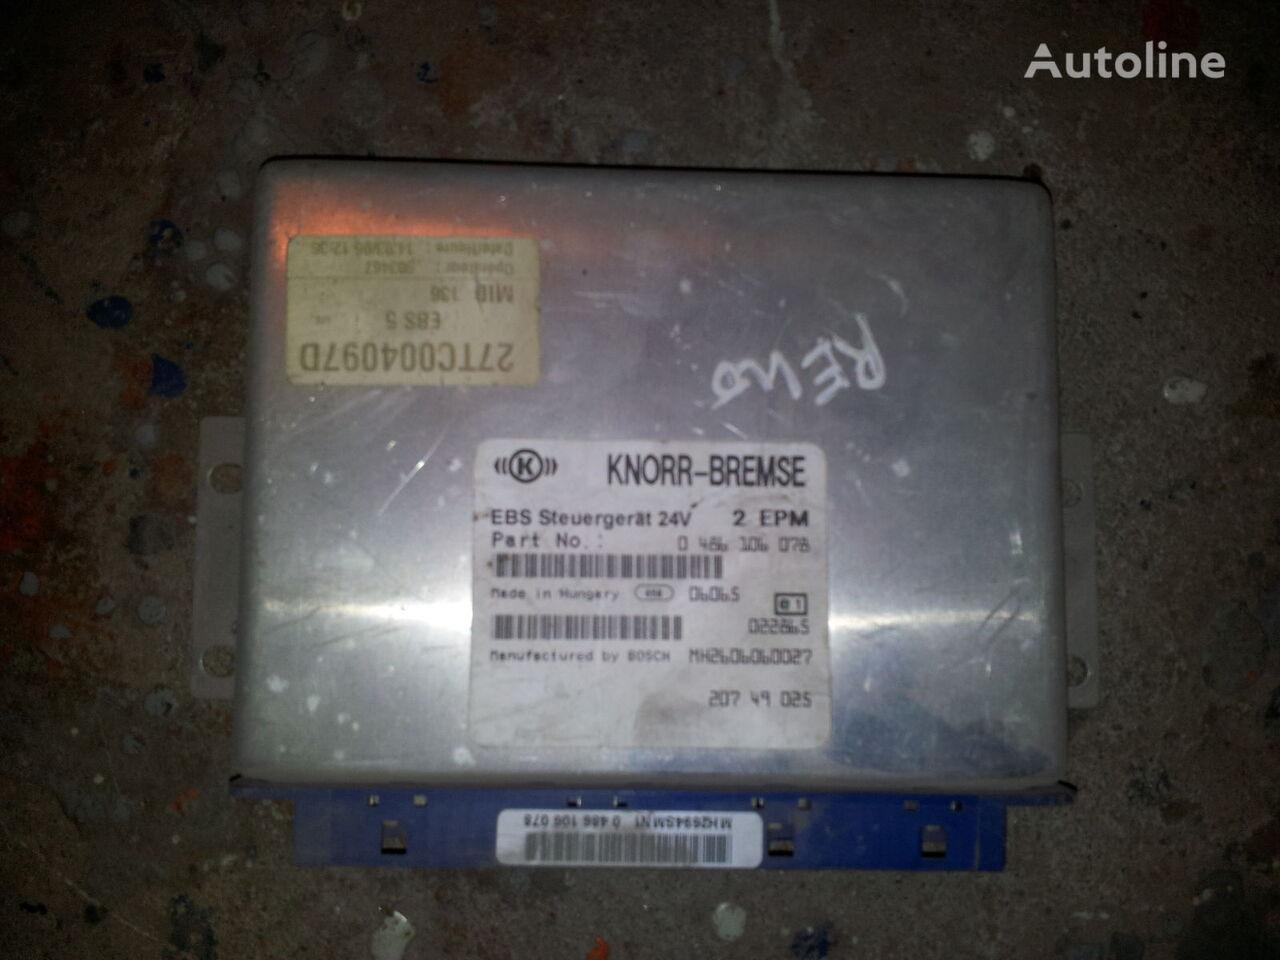 блок за управление  Renault DXI MAGNUM, PREMIUM EBS Control unit 20749025, 20895573, 0486106078, 0486106085, 20895576, 85110026, 85129471, 85110025, 20895573 за влекач RENAULT Magnum DXI